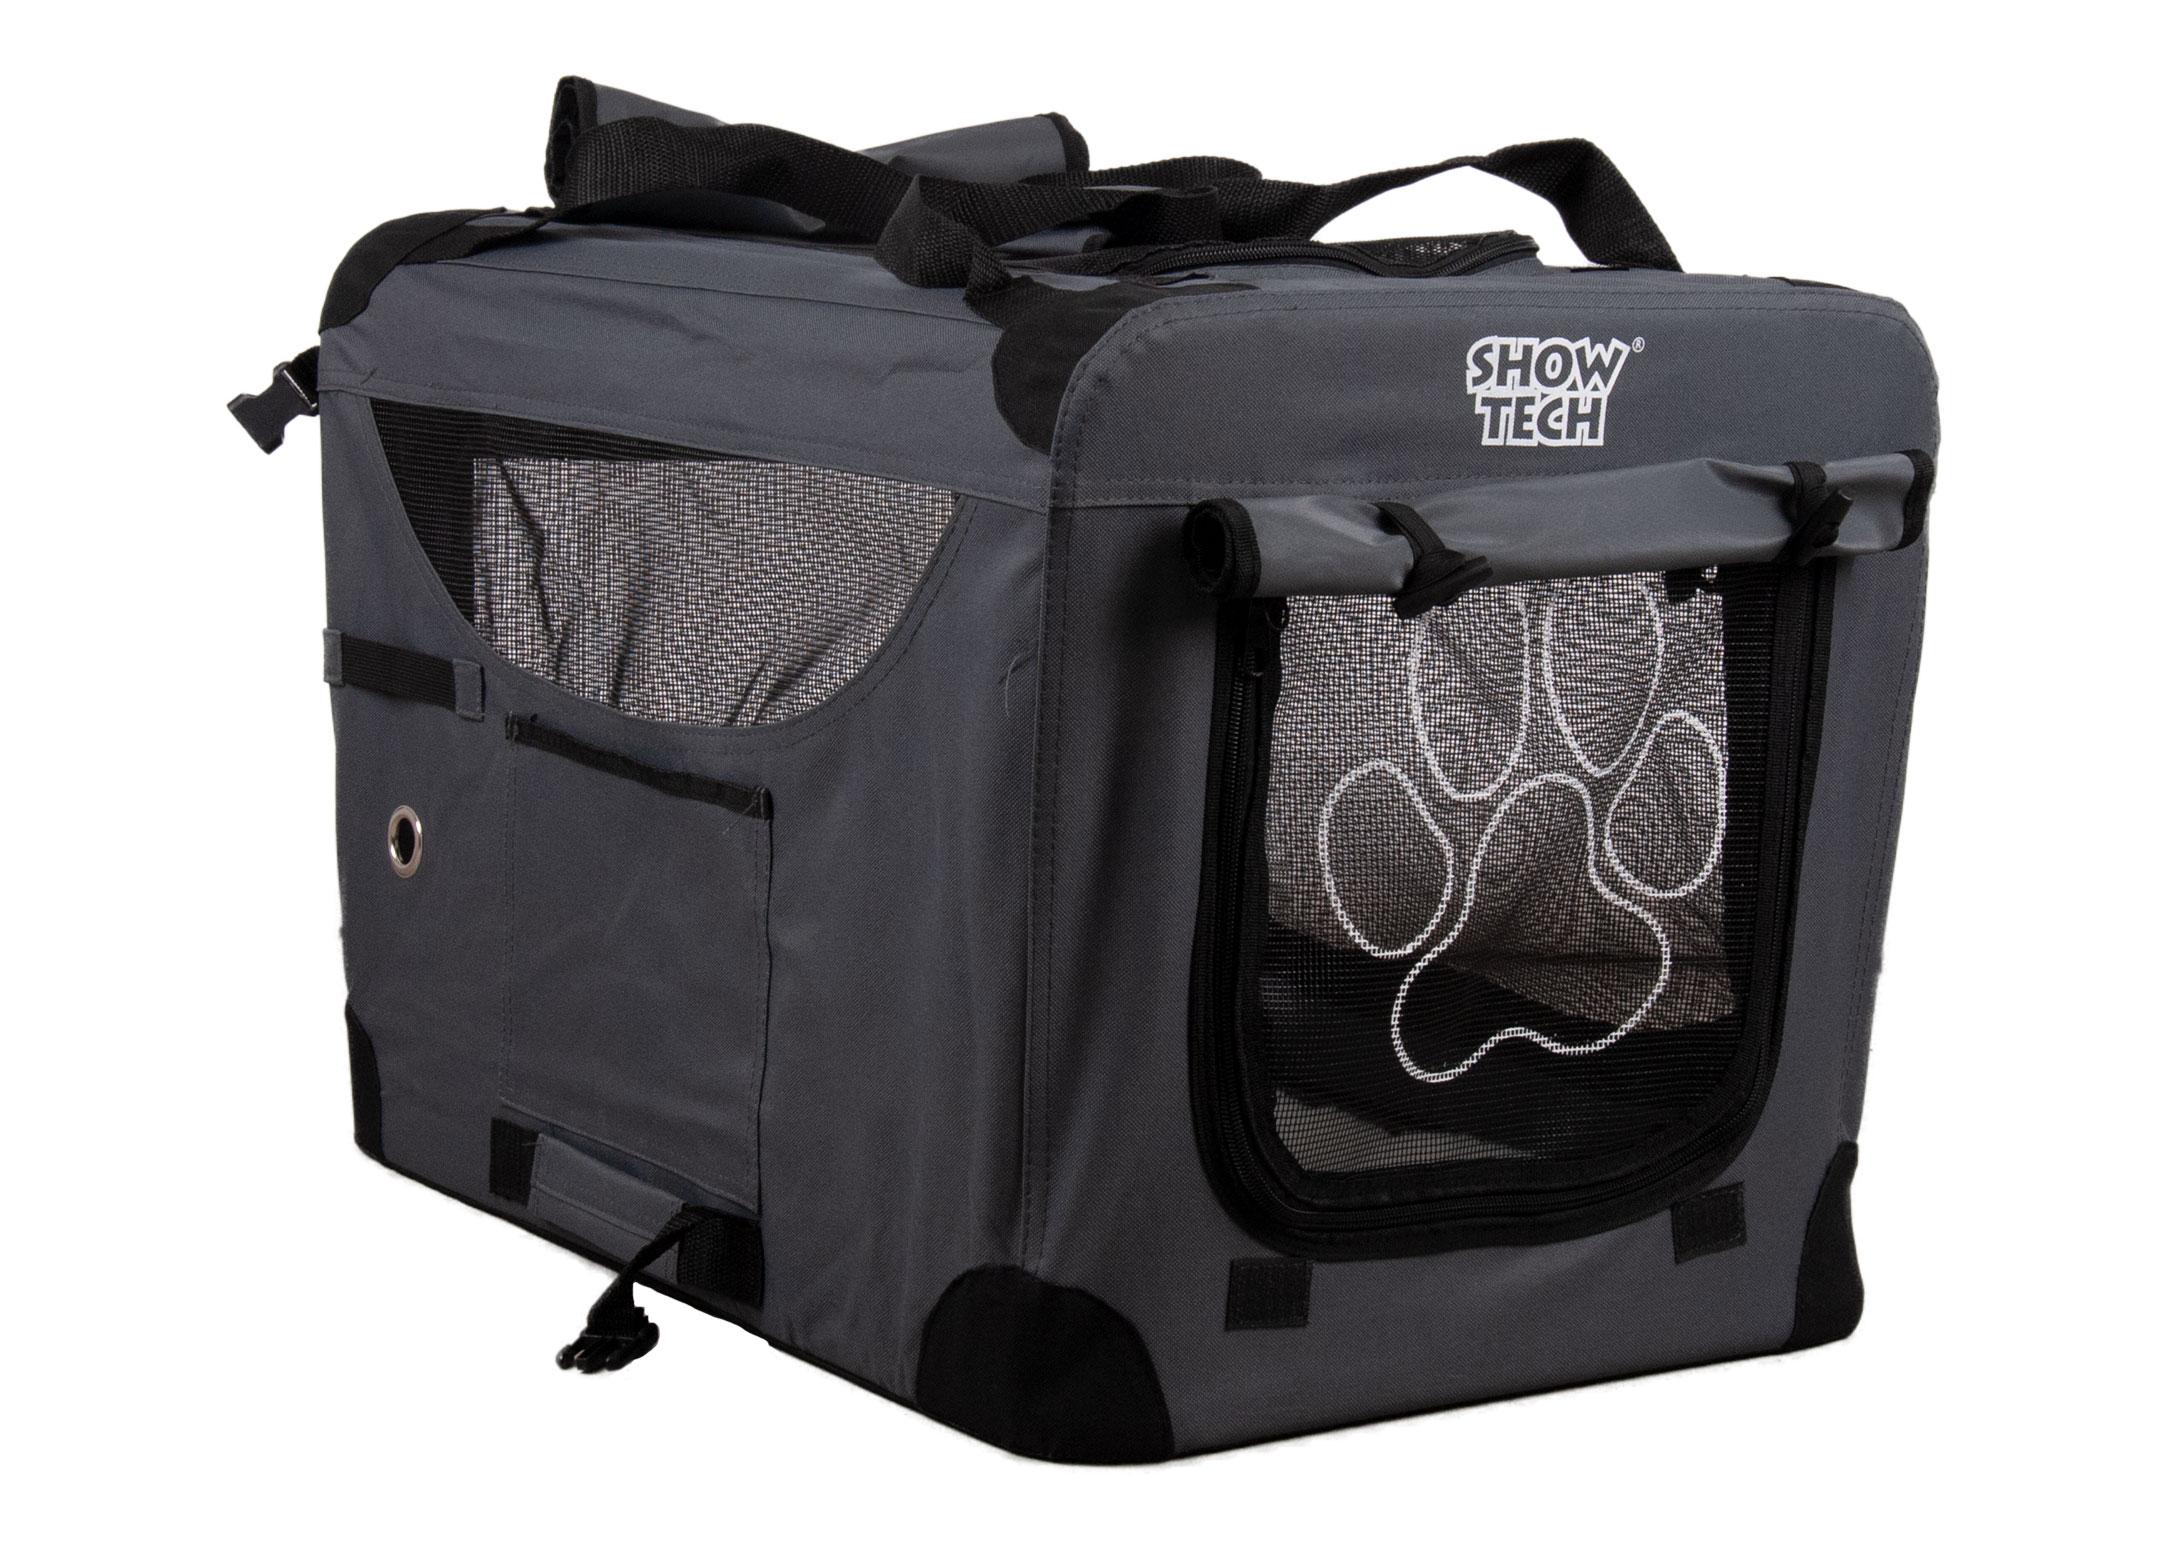 Show Tech Easy Crate Khaki x Black Size 00 - L49,5xW34,5cmxH35cm Traveling Crate